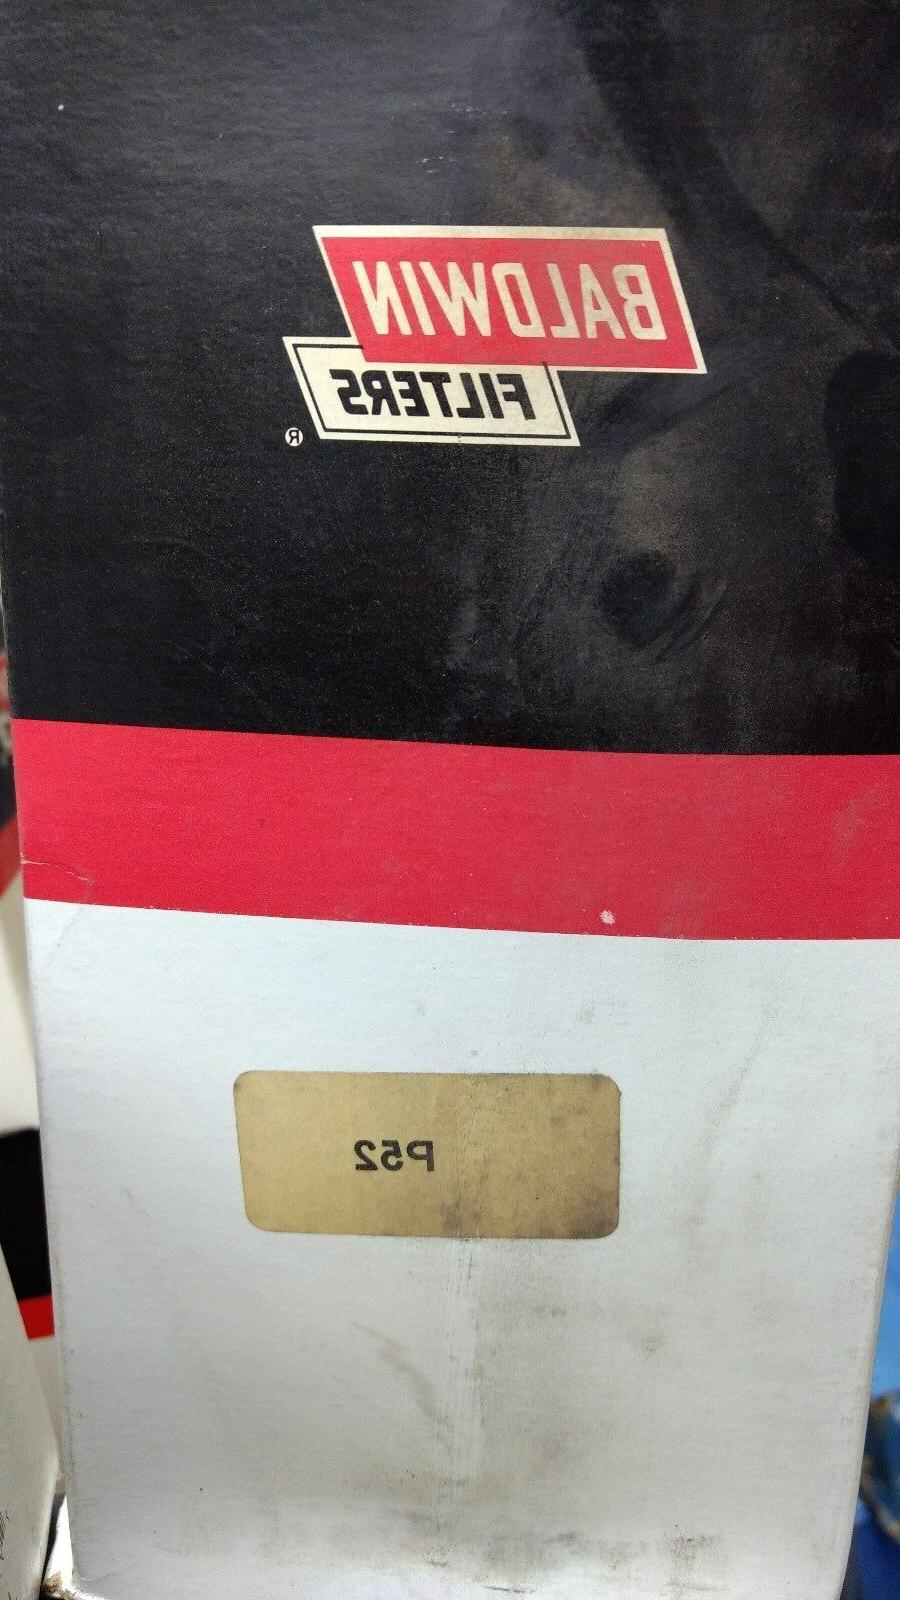 p52 oil filter element